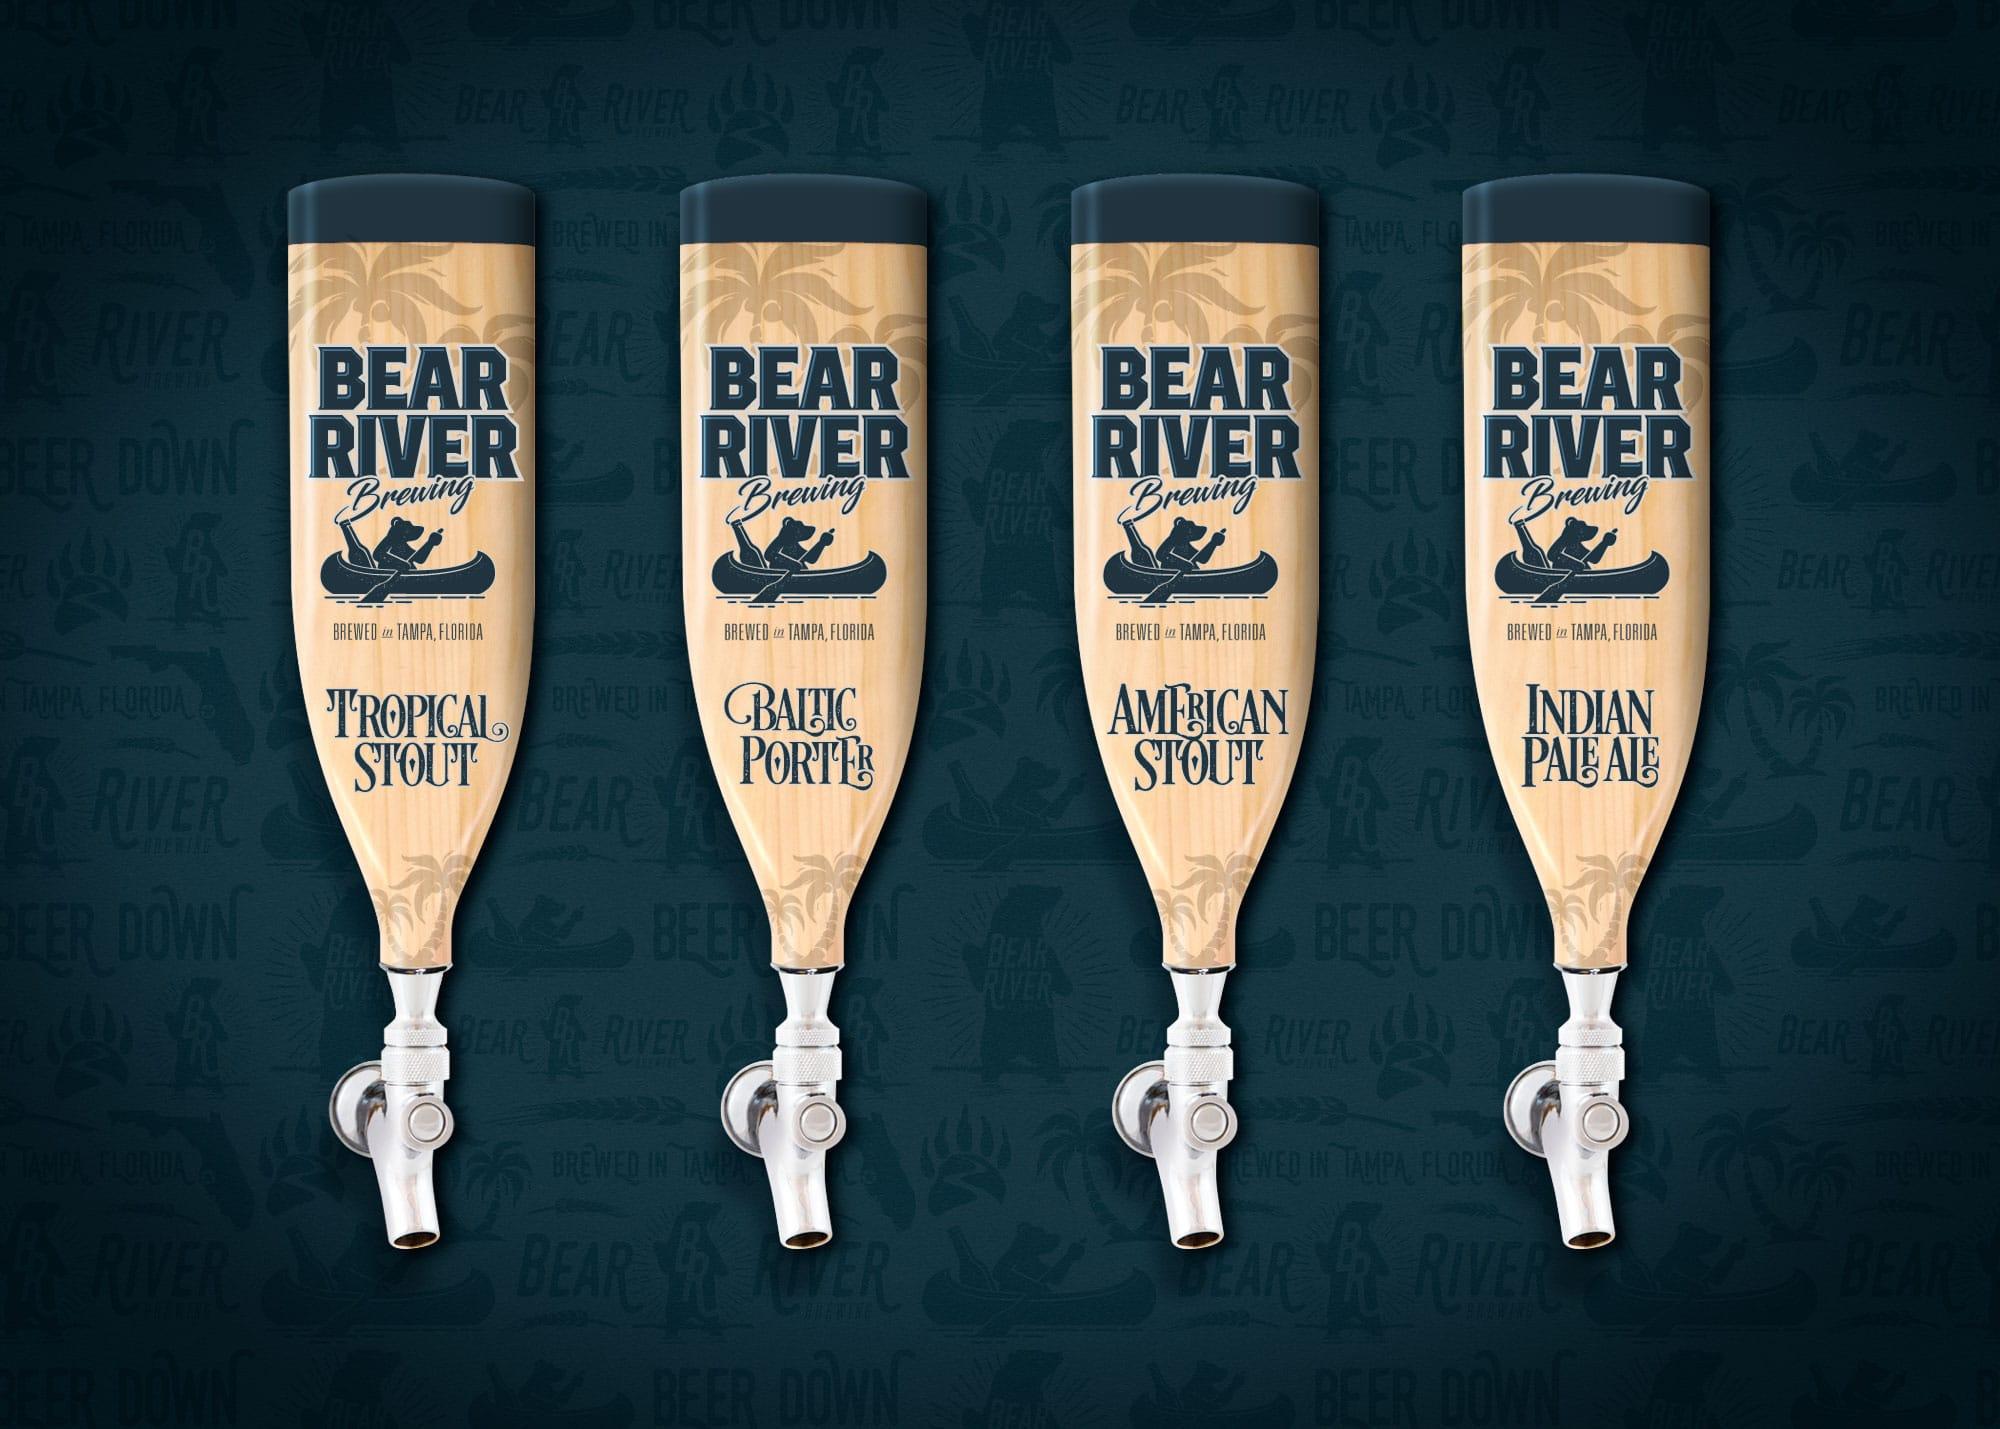 Bear River Brewing branded beer taps